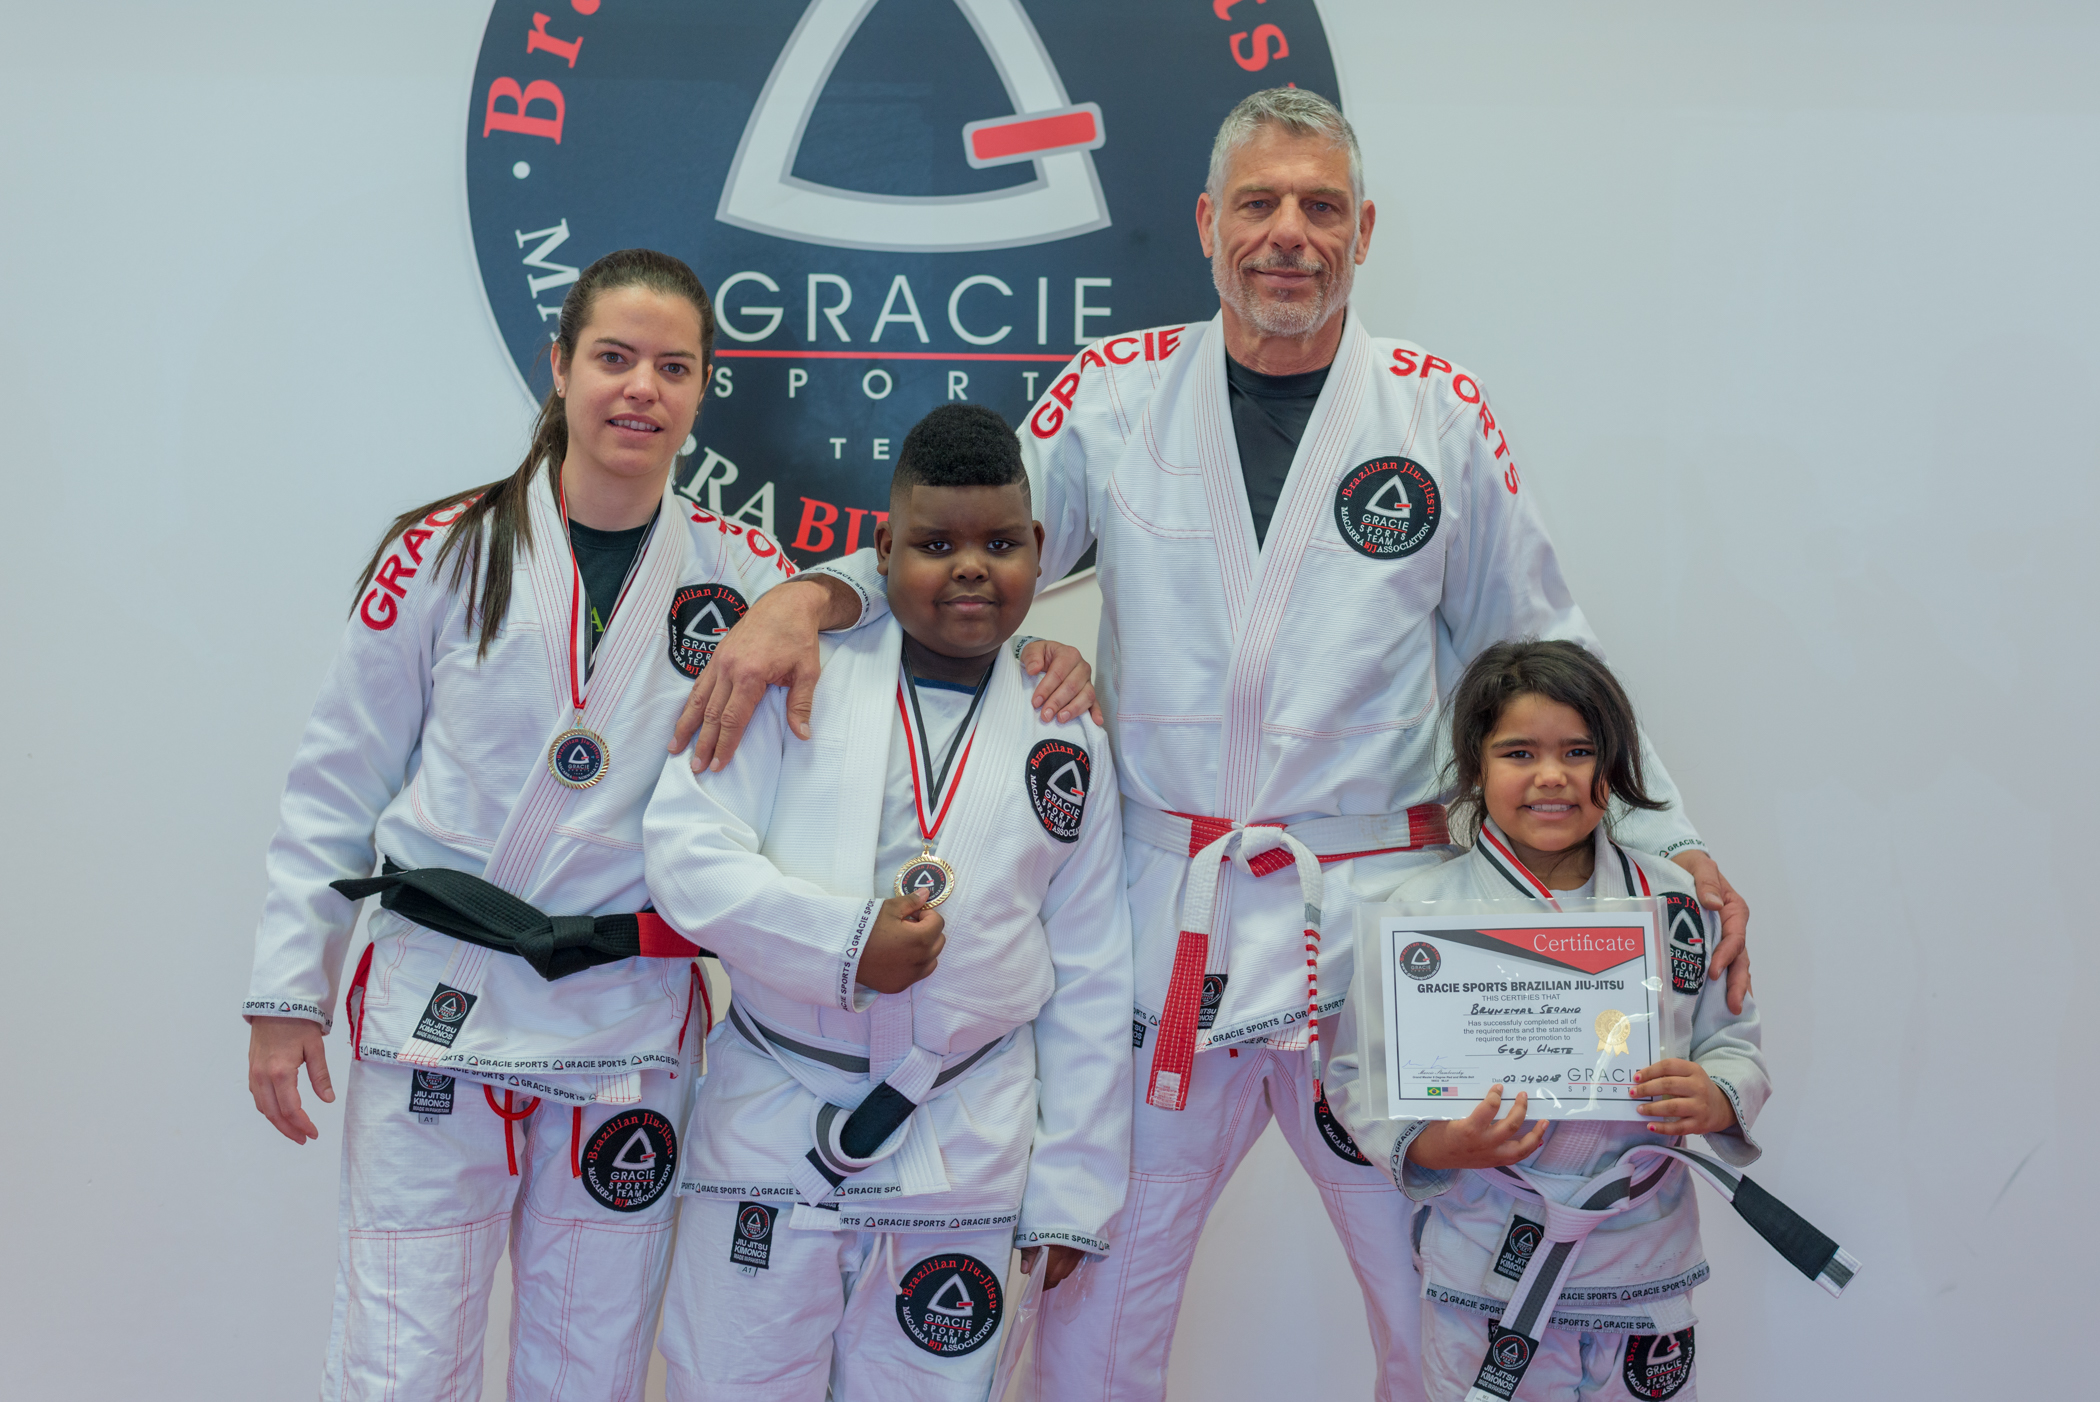 Gracie-Sports-Kids-165.jpg